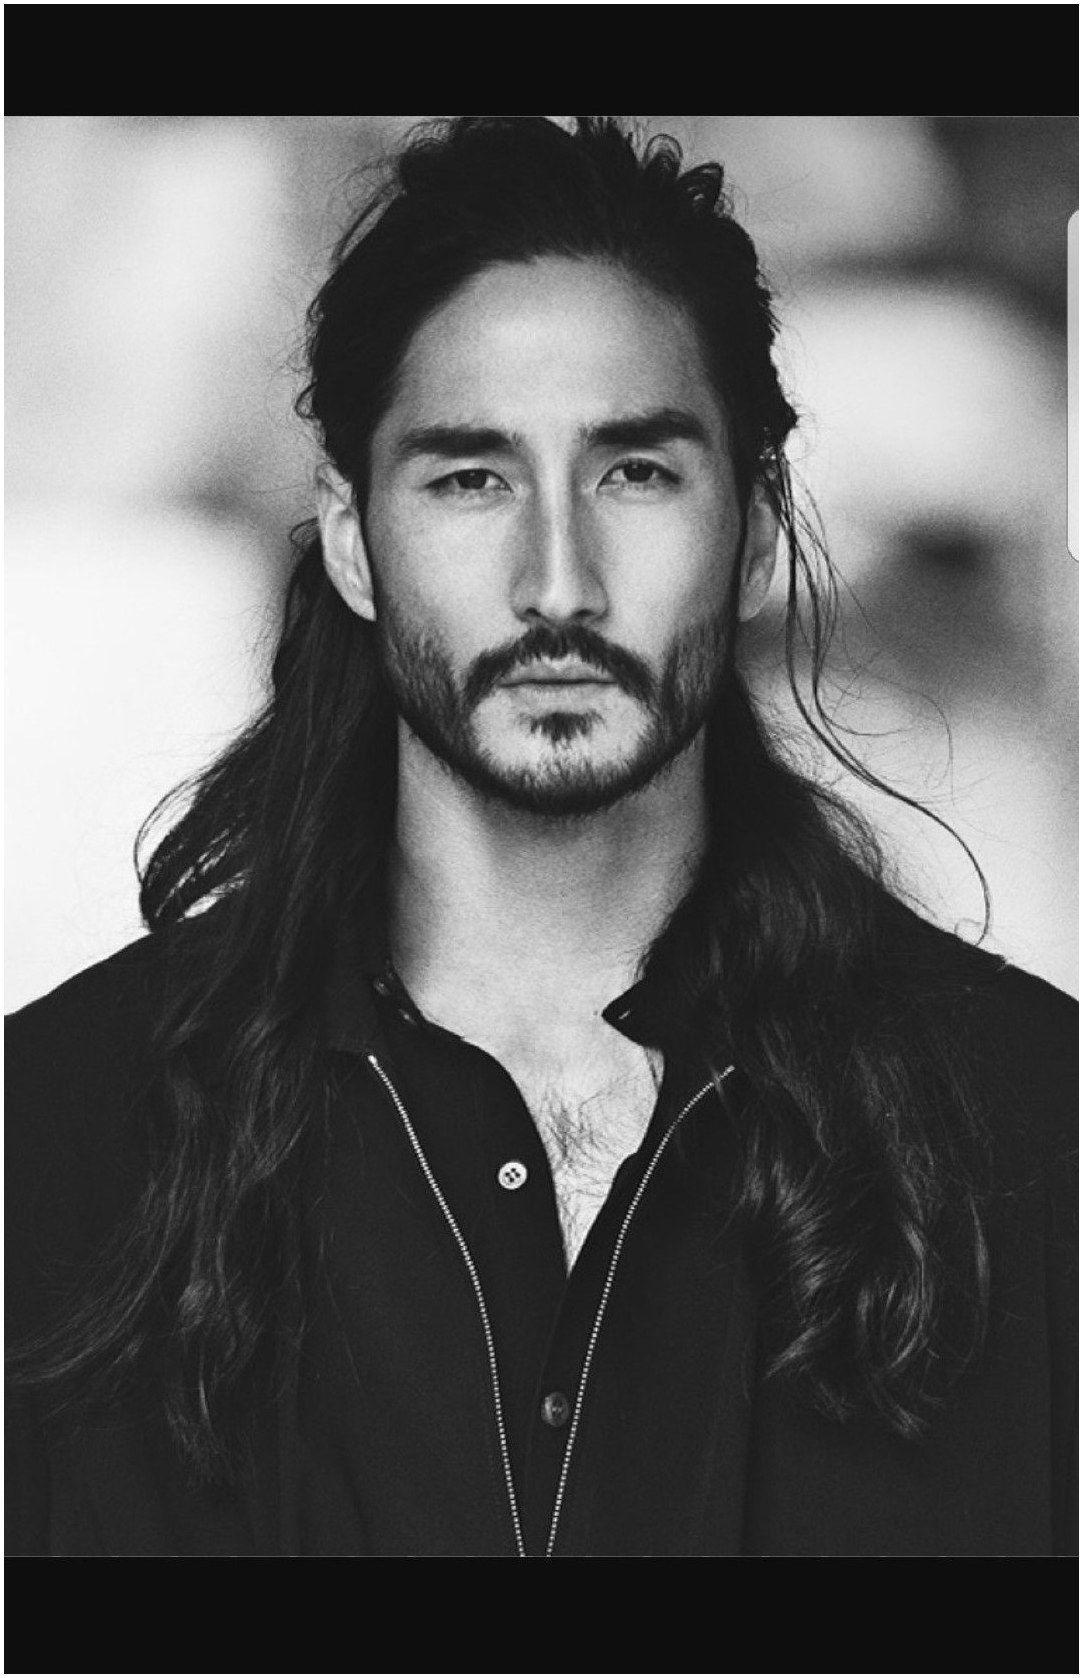 long hairstyles for men in 2017 longer hair has always been